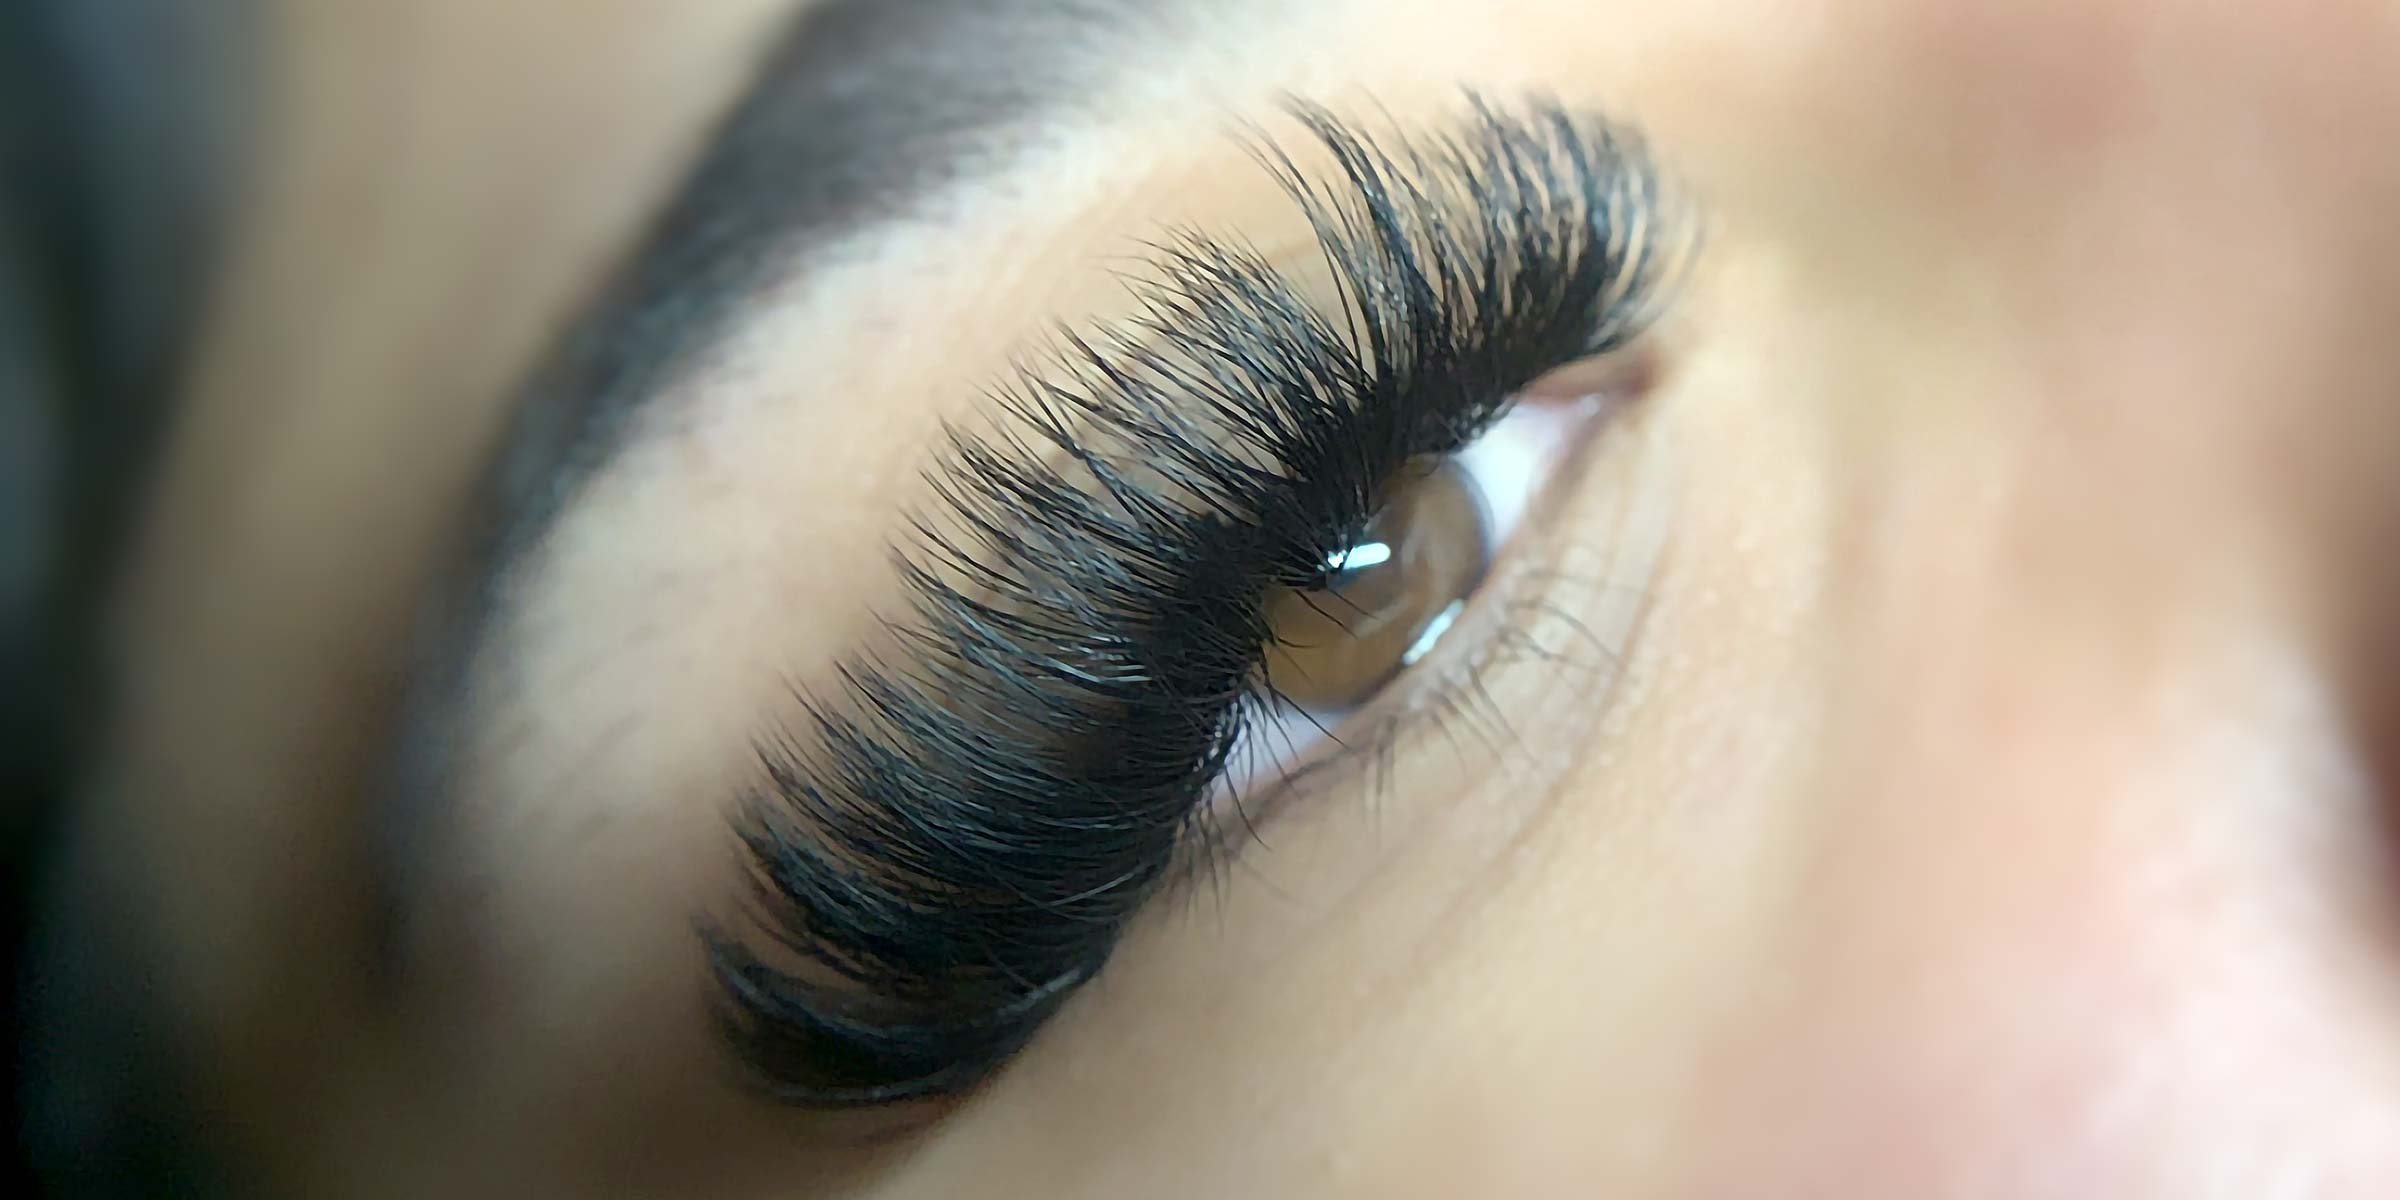 hero-eyelash-extensions-closeup-mobile